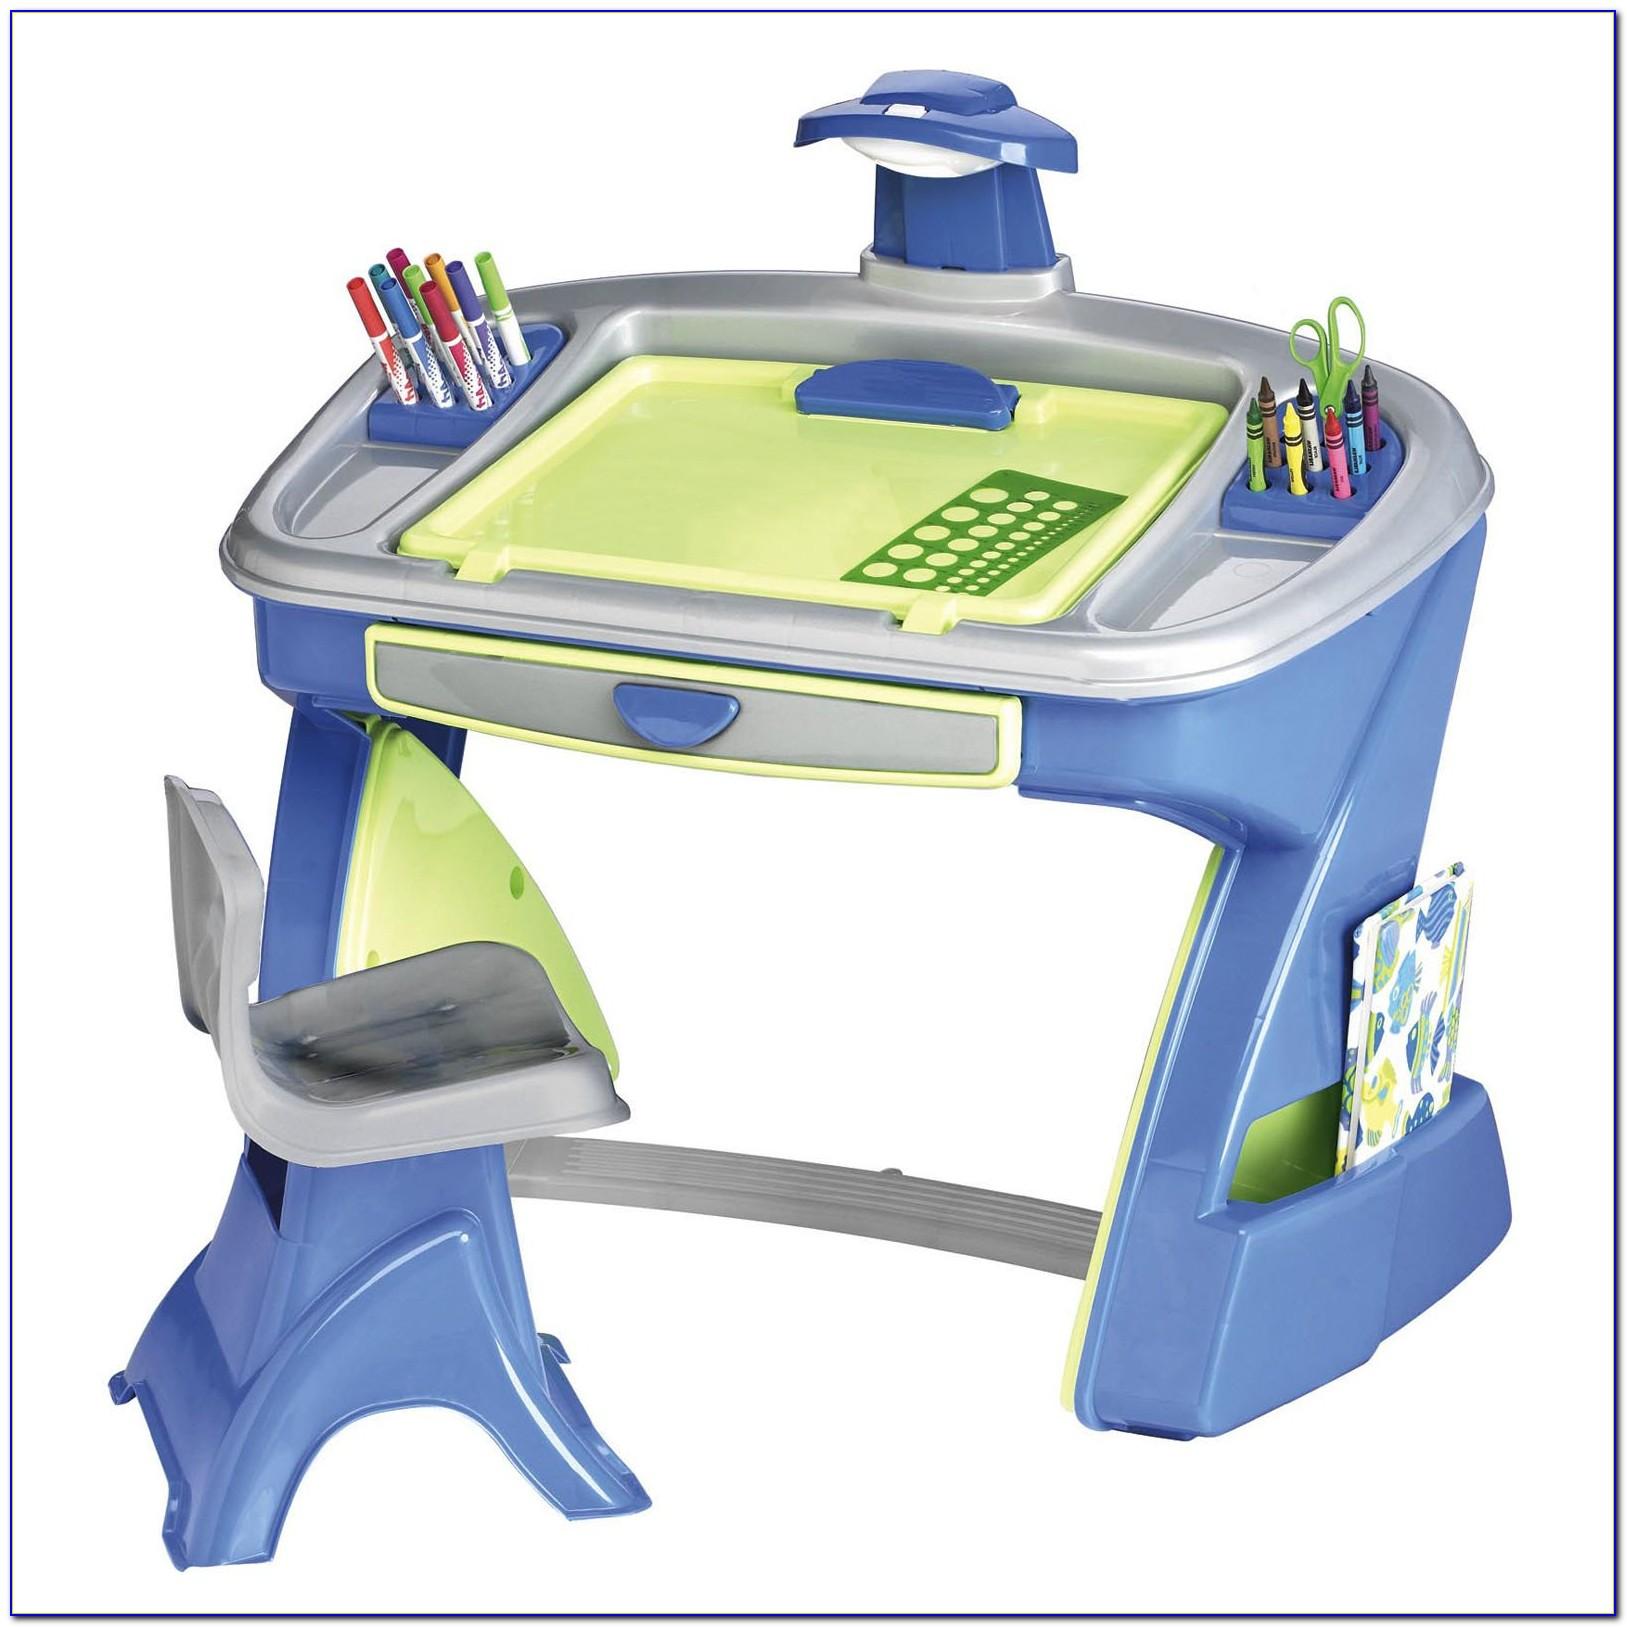 Children's Art Desk And Easel - Desk : Home Design Ideas ... on Easel Decorating Ideas  id=58783